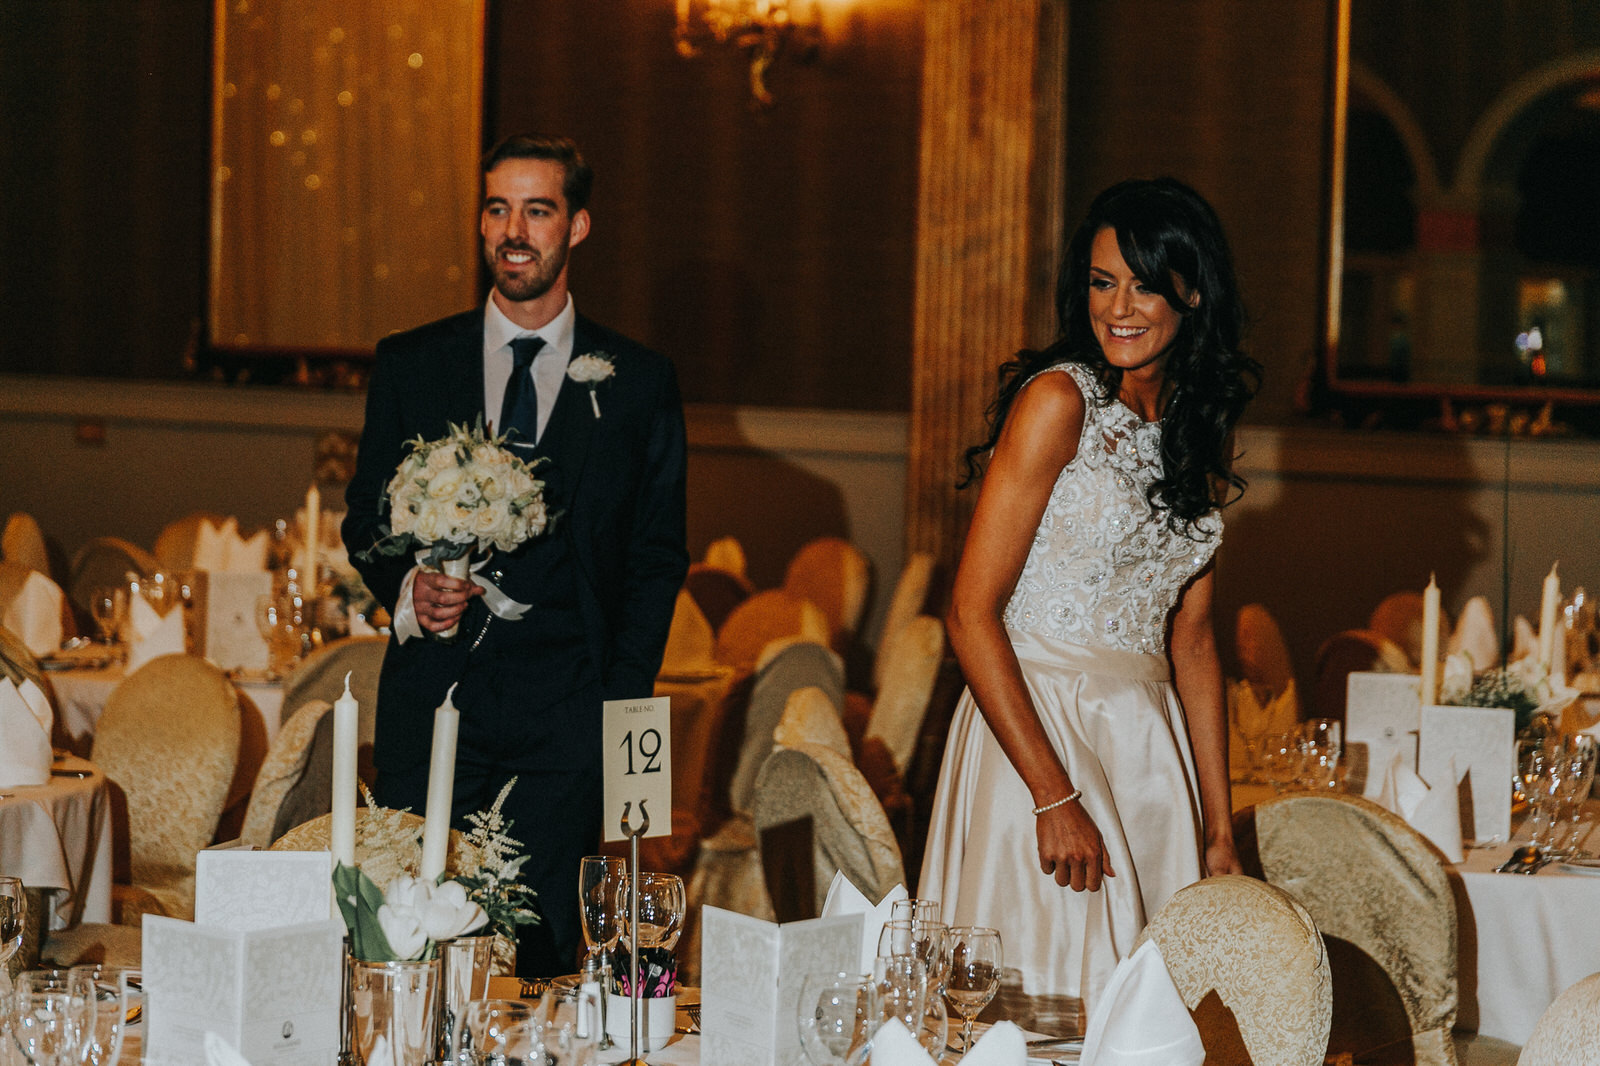 Roger_Kenny_wedding_photographer_483.jpg